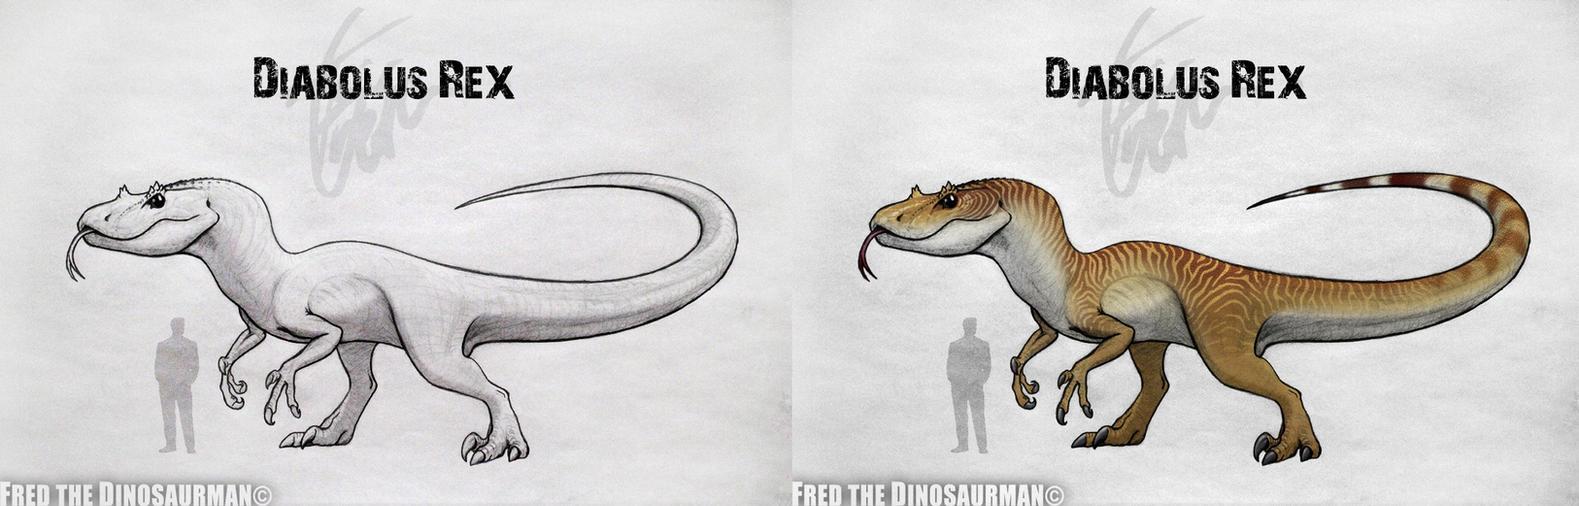 Diabolus Rex | Jurassic World by FredtheDinosaurman on ...